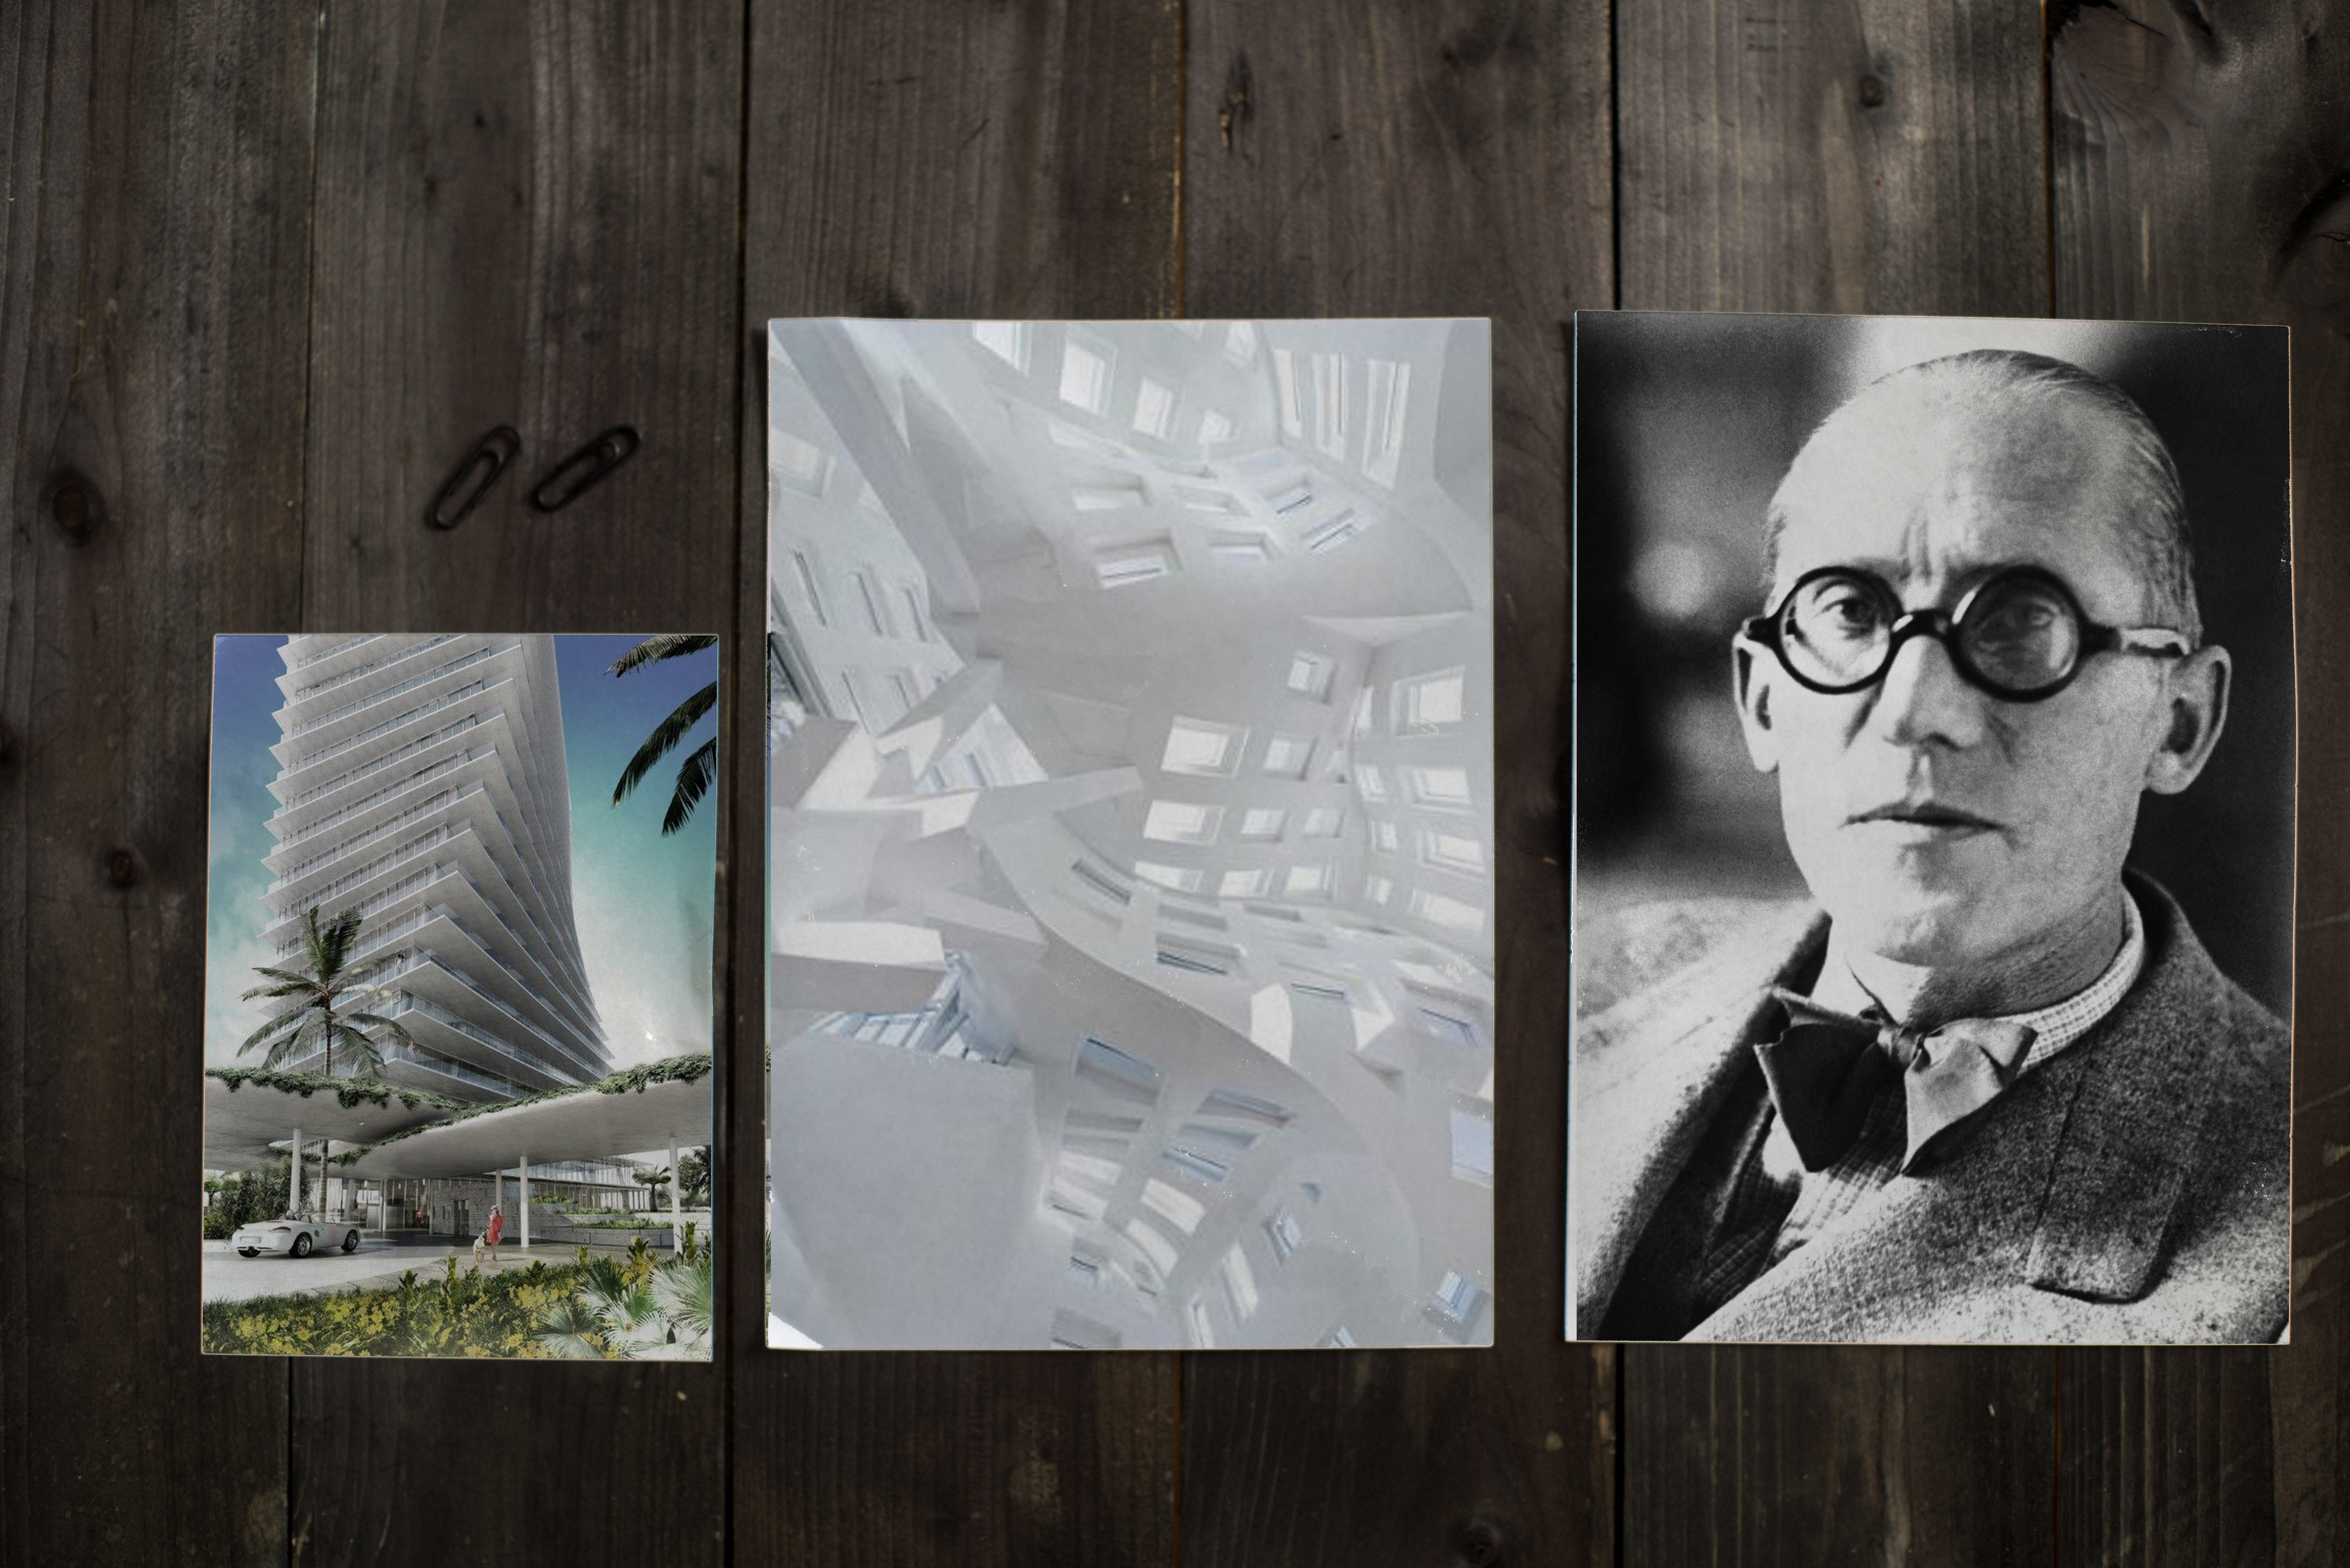 Mockup archiTEXTen Corbusier BIG Ghery